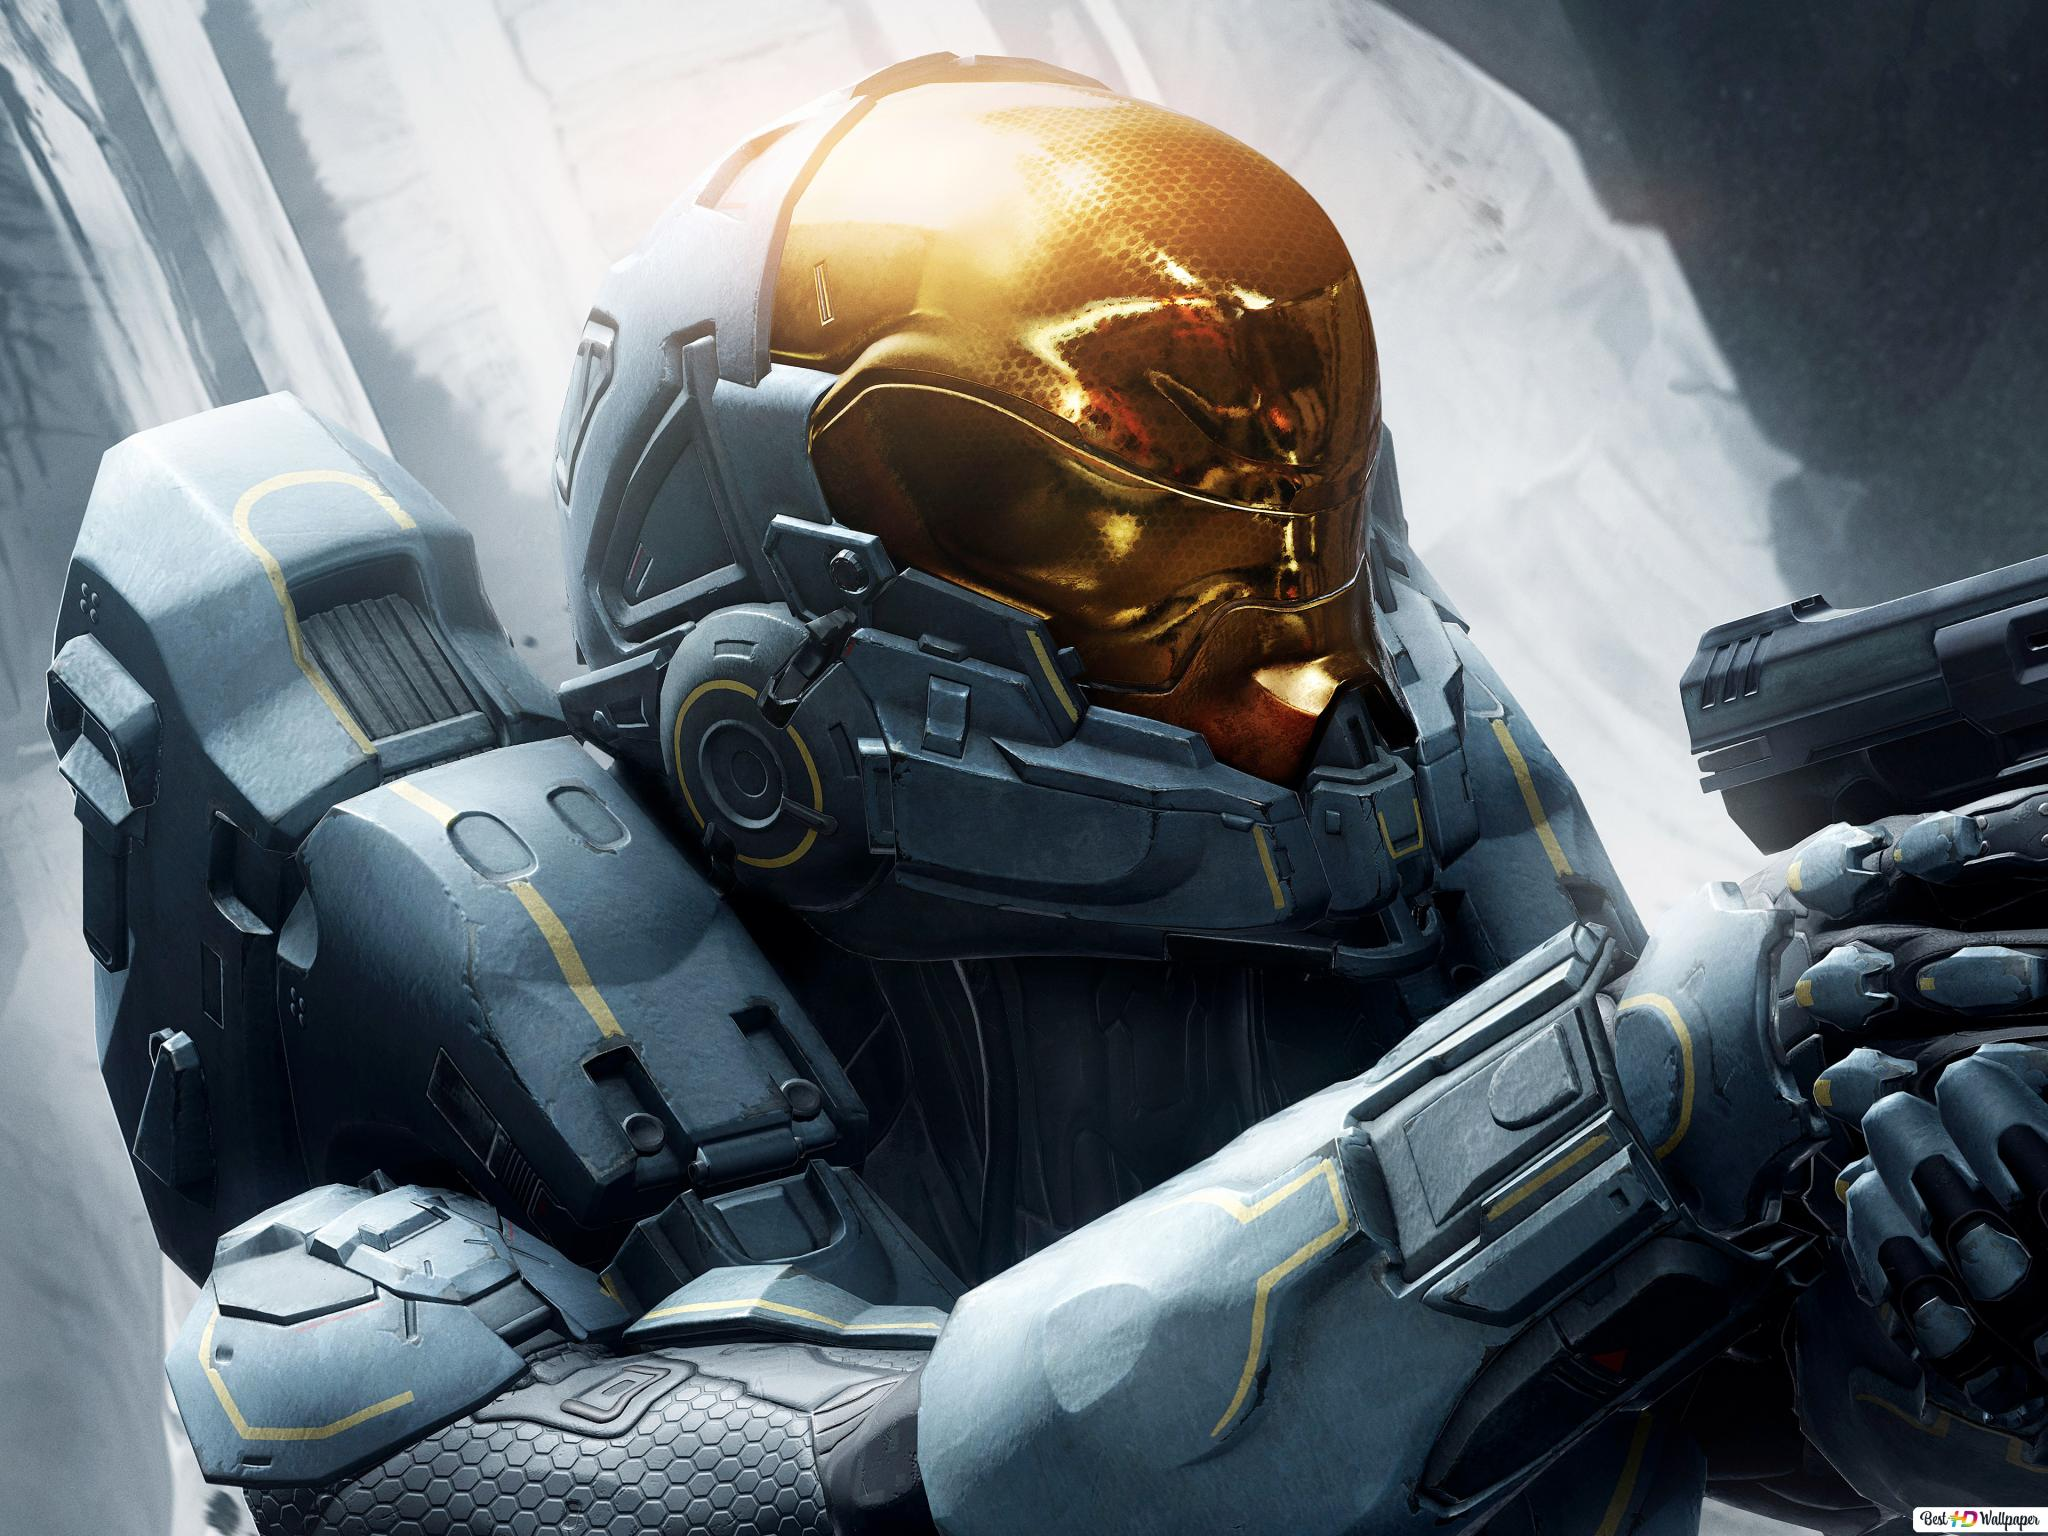 Halo 5 Guardians Kelly Hd Wallpaper Download